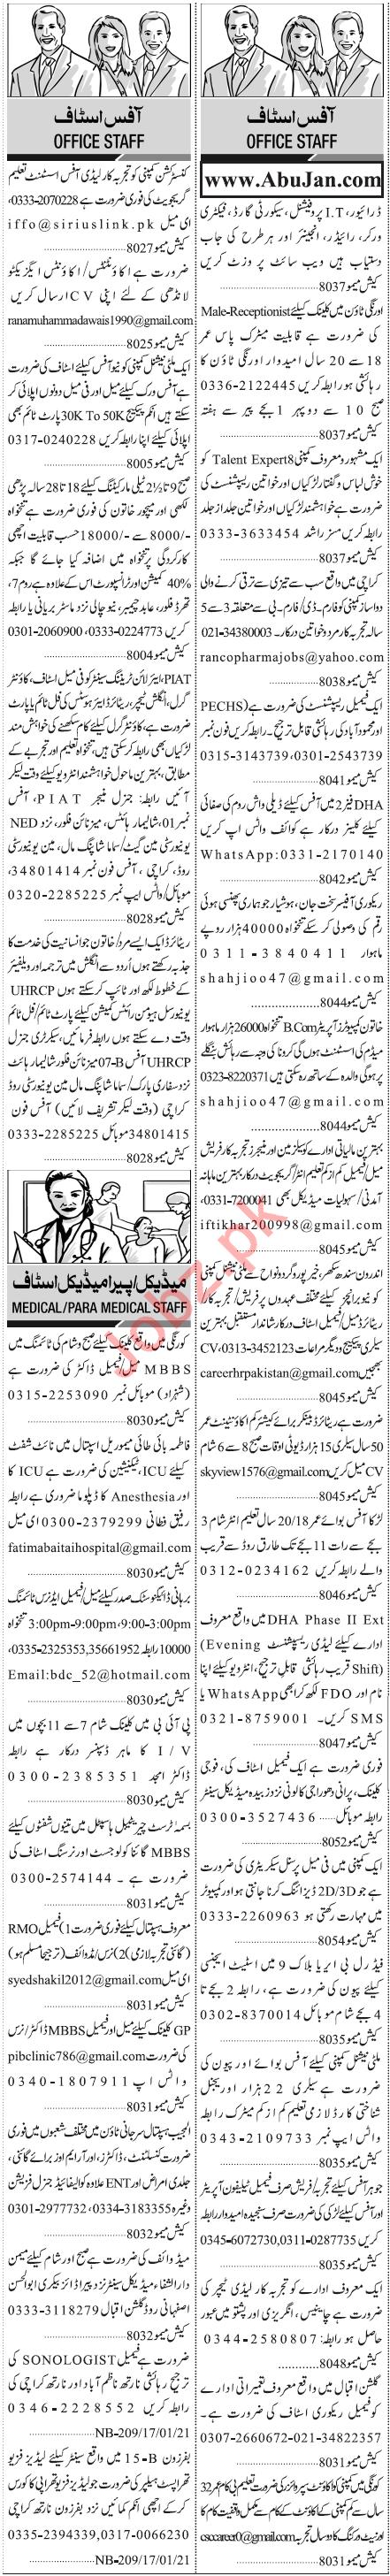 IT Professional Engineer Accountant Jobs in Karachi